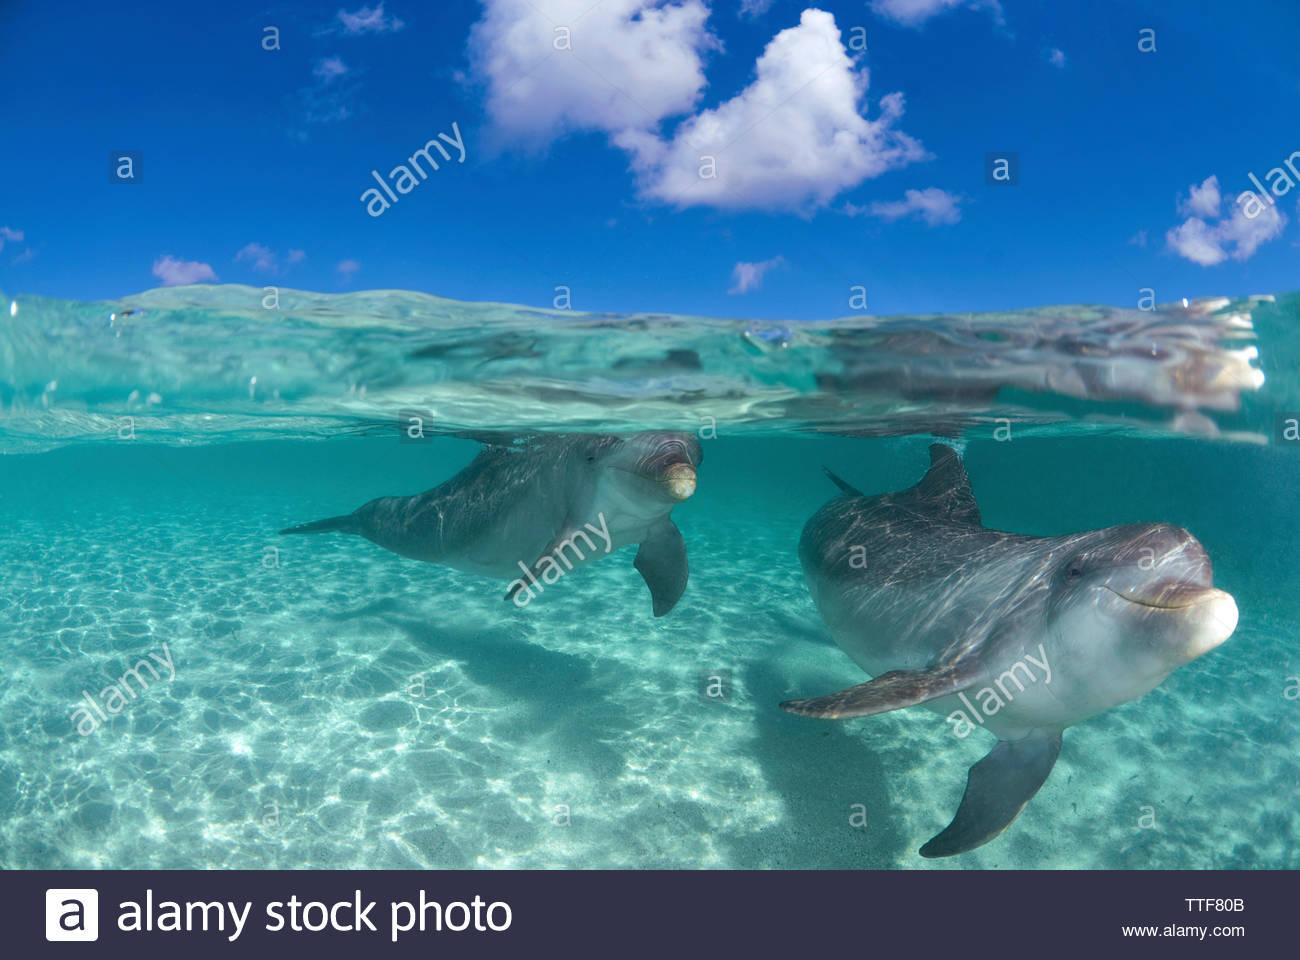 Bottlenose dolphins (Tursiops truncatus), pair, split level, over under water, Roatan island, Bay islands, Honduras - Stock Image